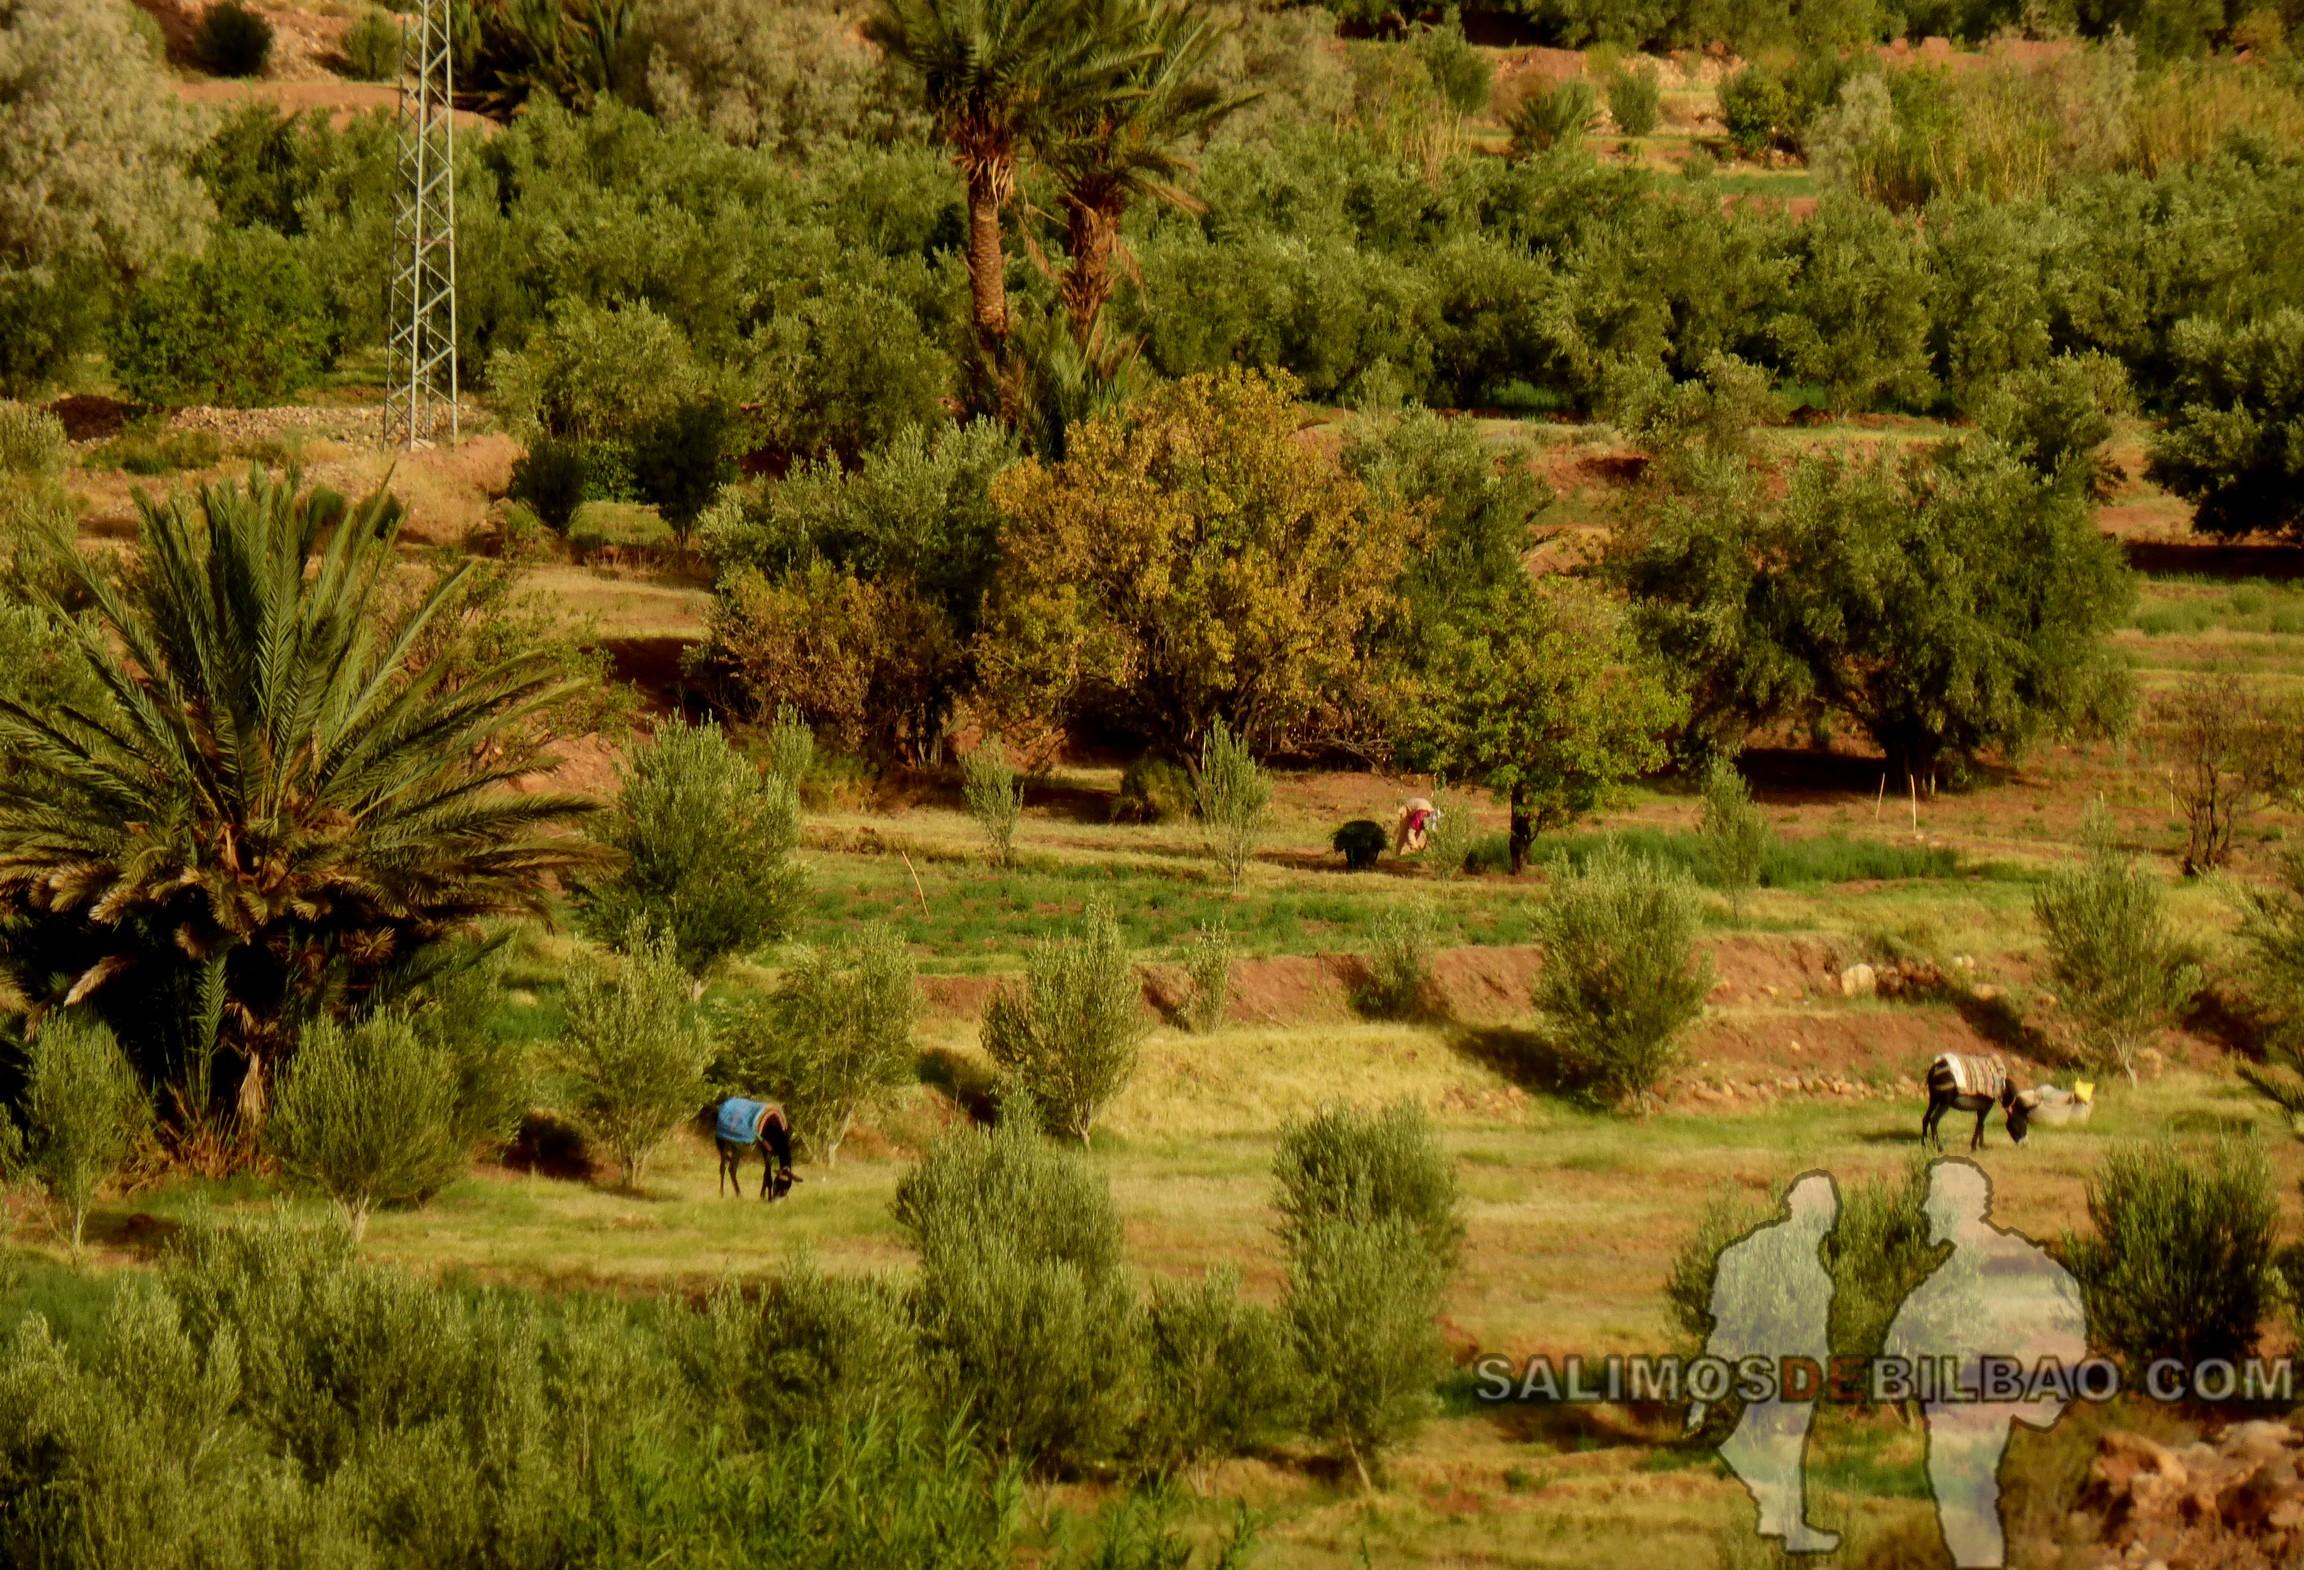 632. Rodeando el Kasbah Ait Ben Haddou